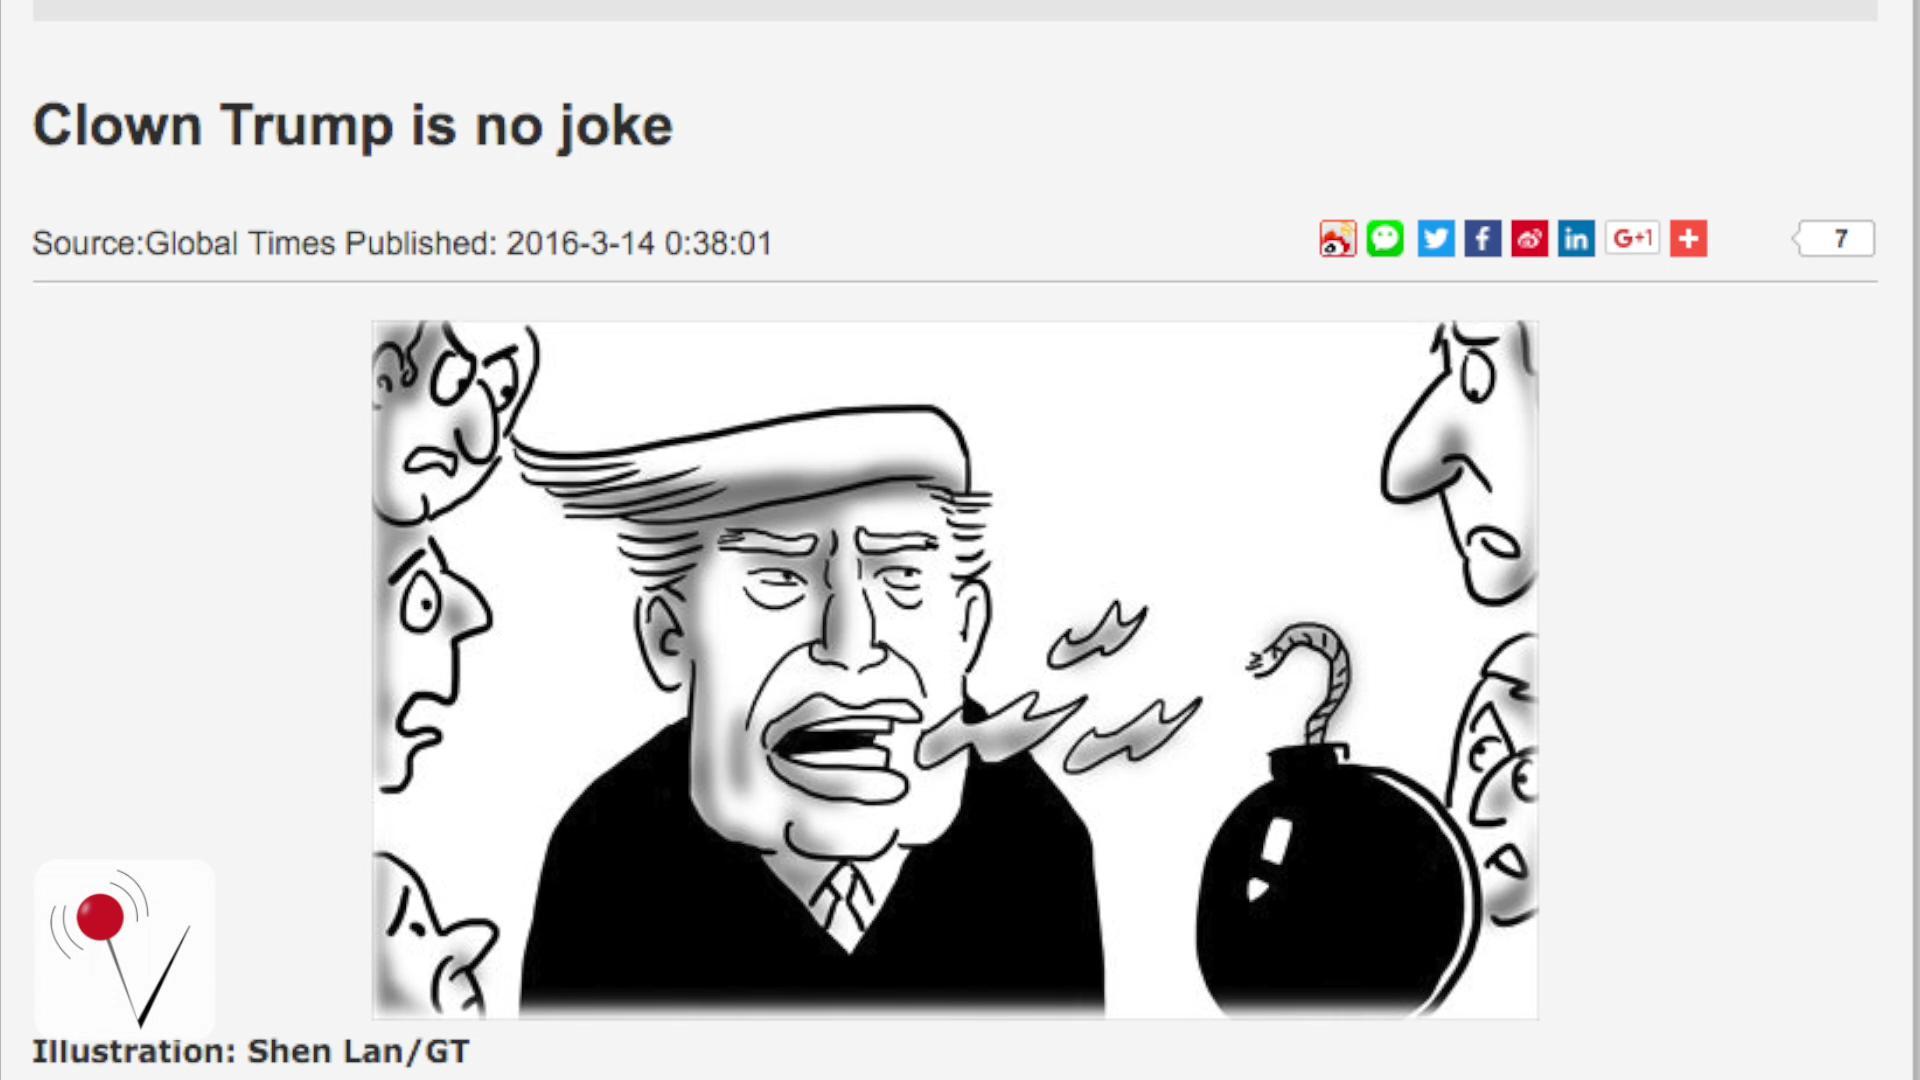 China Blames Democracy for Trump